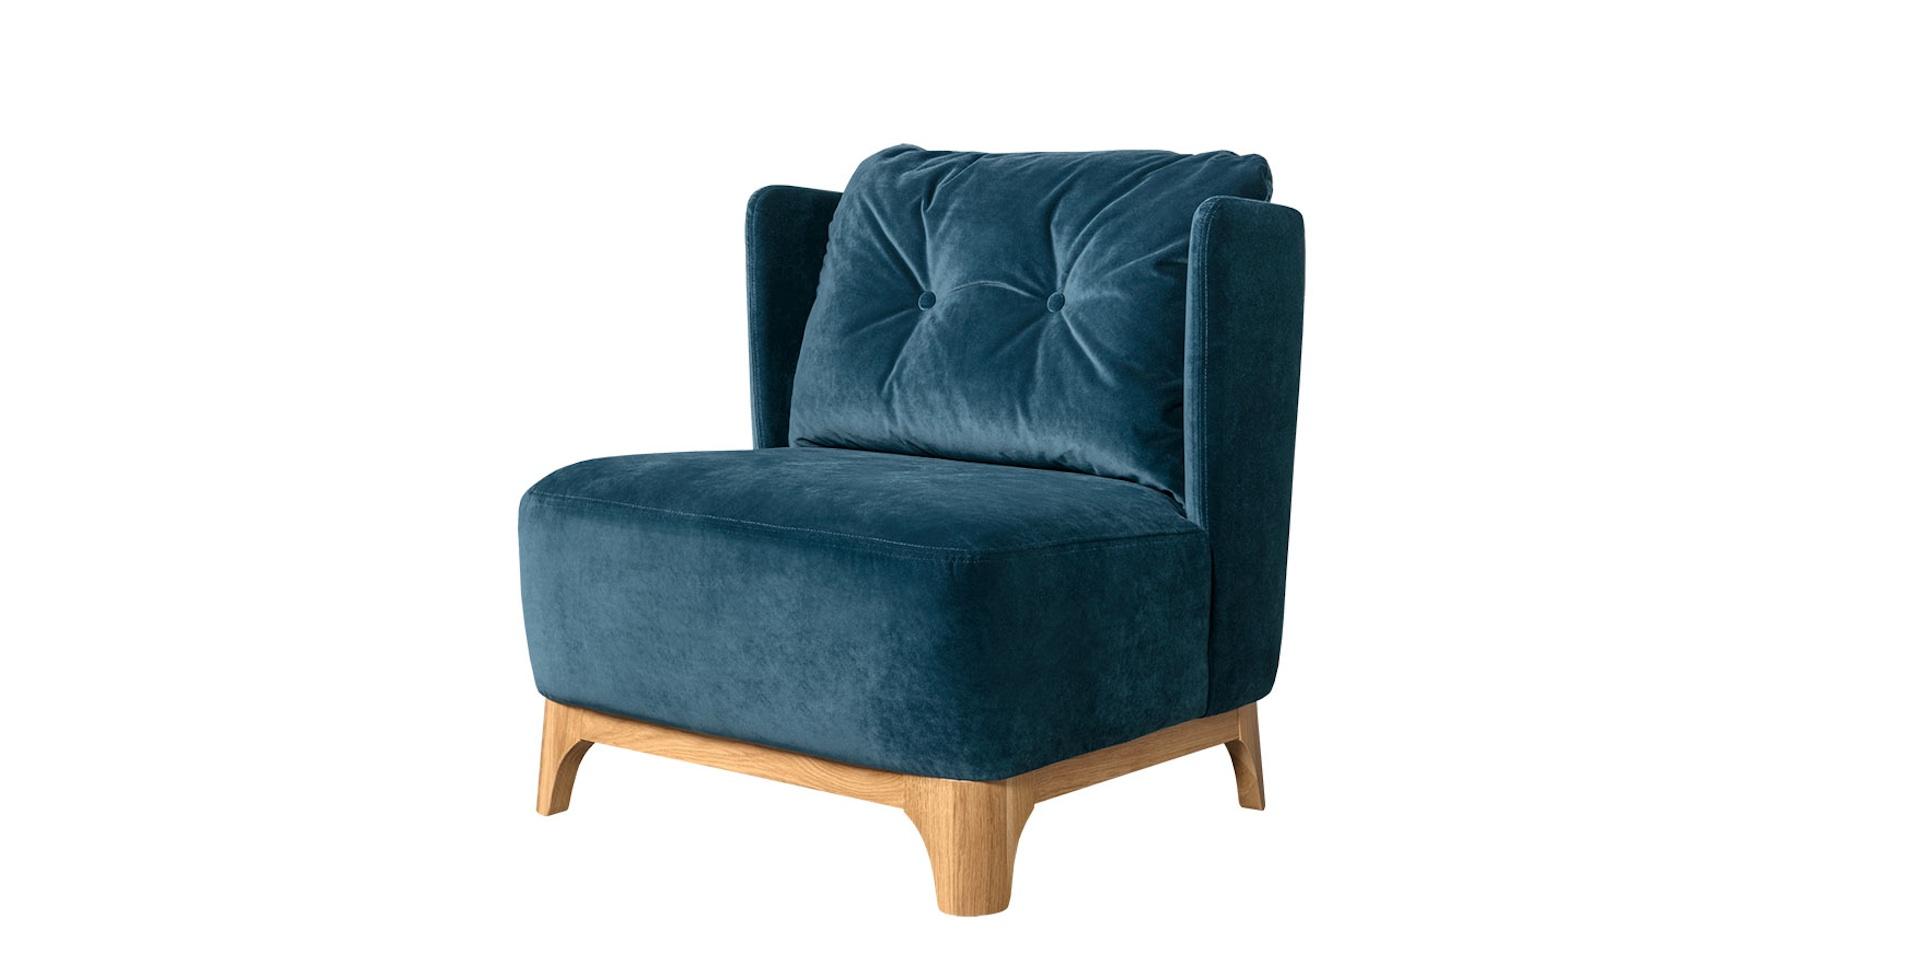 ALMA_armchair_buttons_classic_velvet12_navy_blue_4